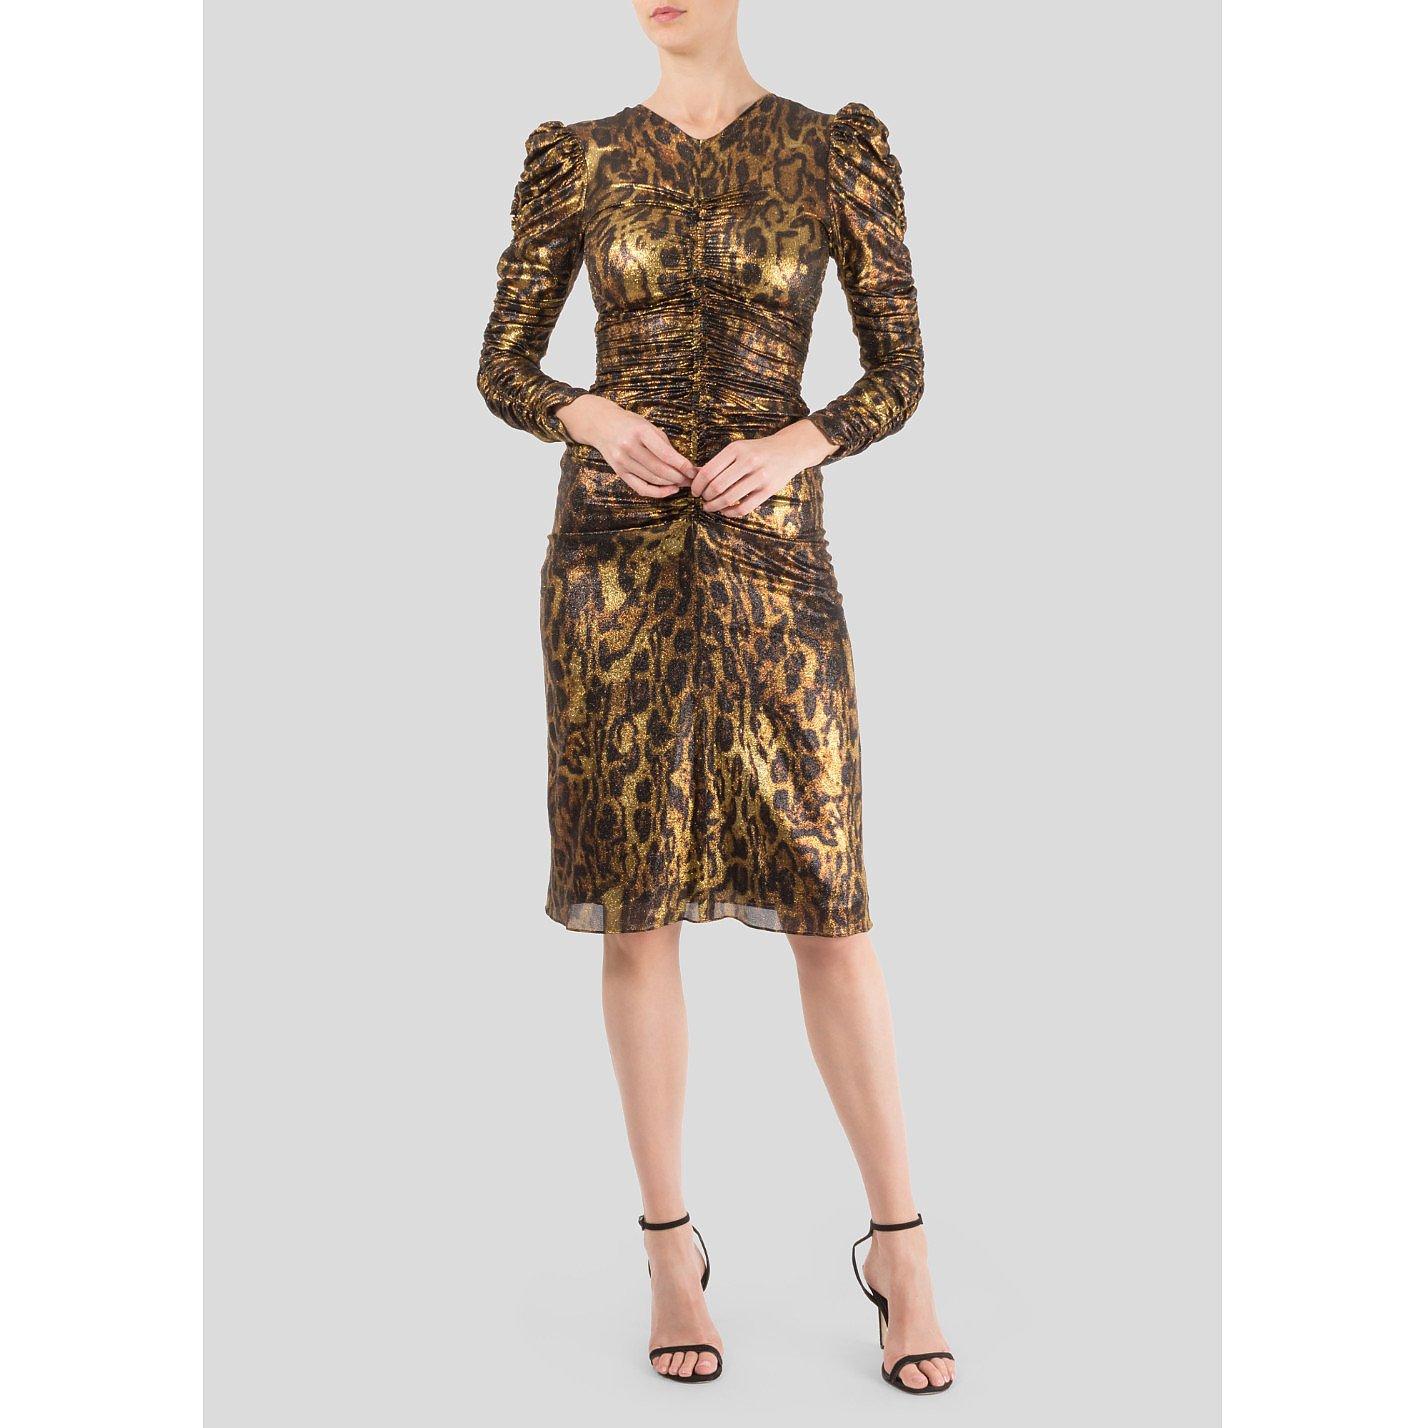 Isabel Marant Ruched Metallic Leopard Dress